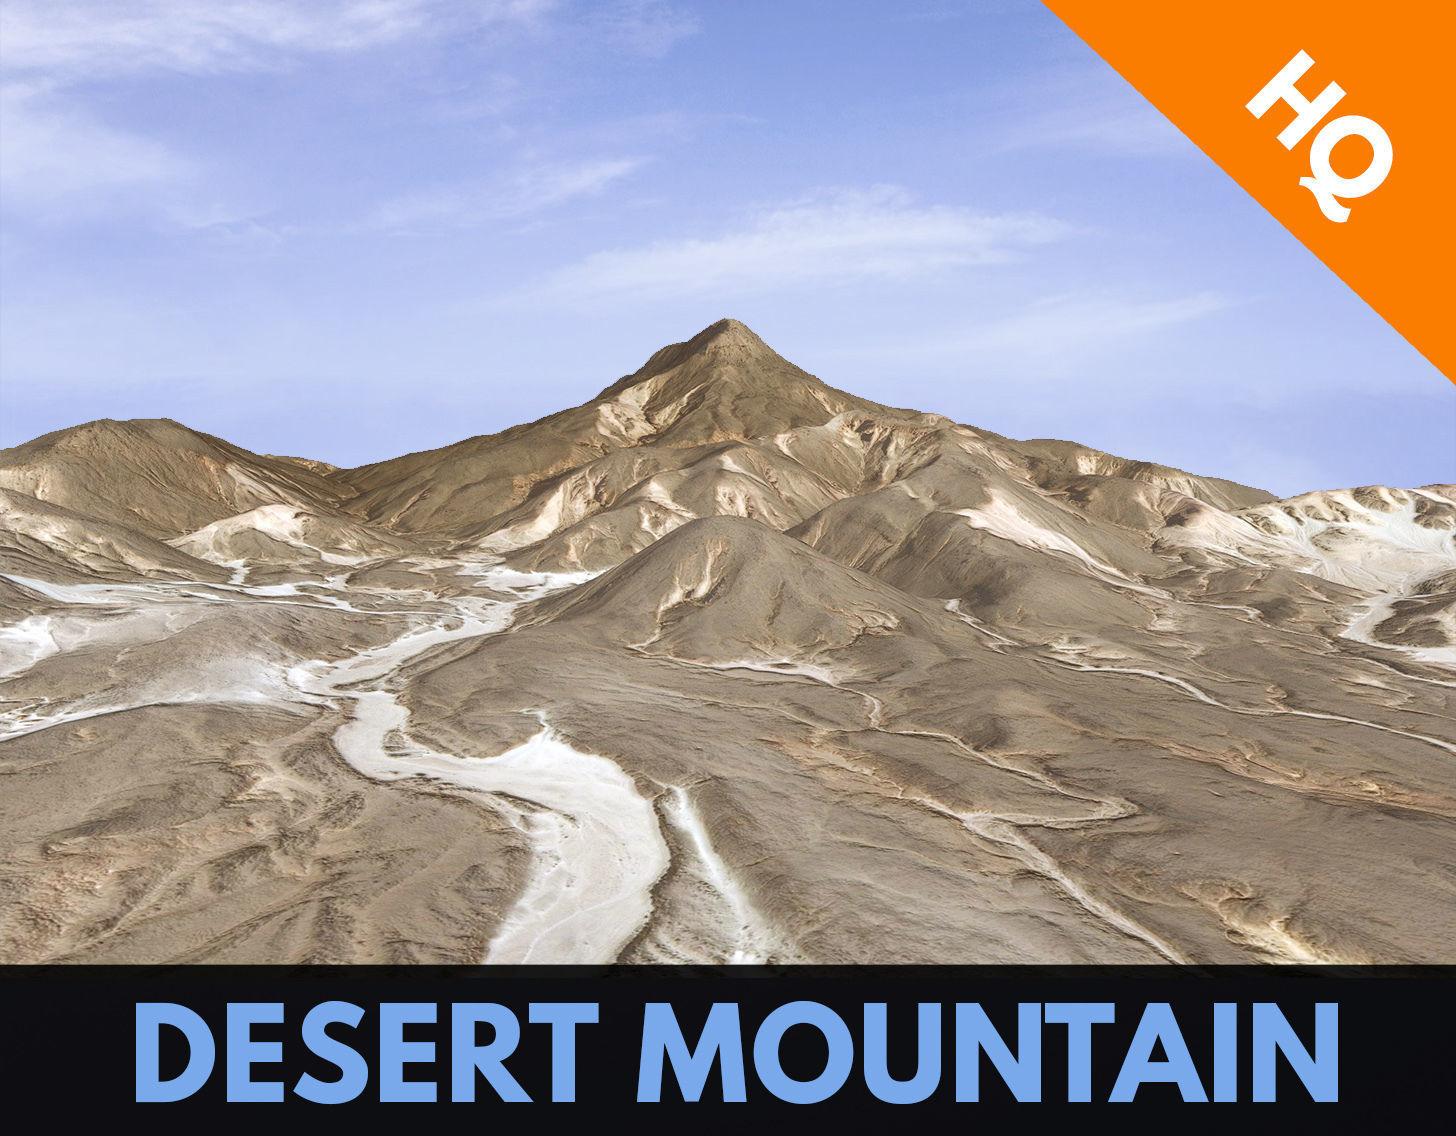 Desert Mountain Rocks Landscape Terrain Cliff PBR  07